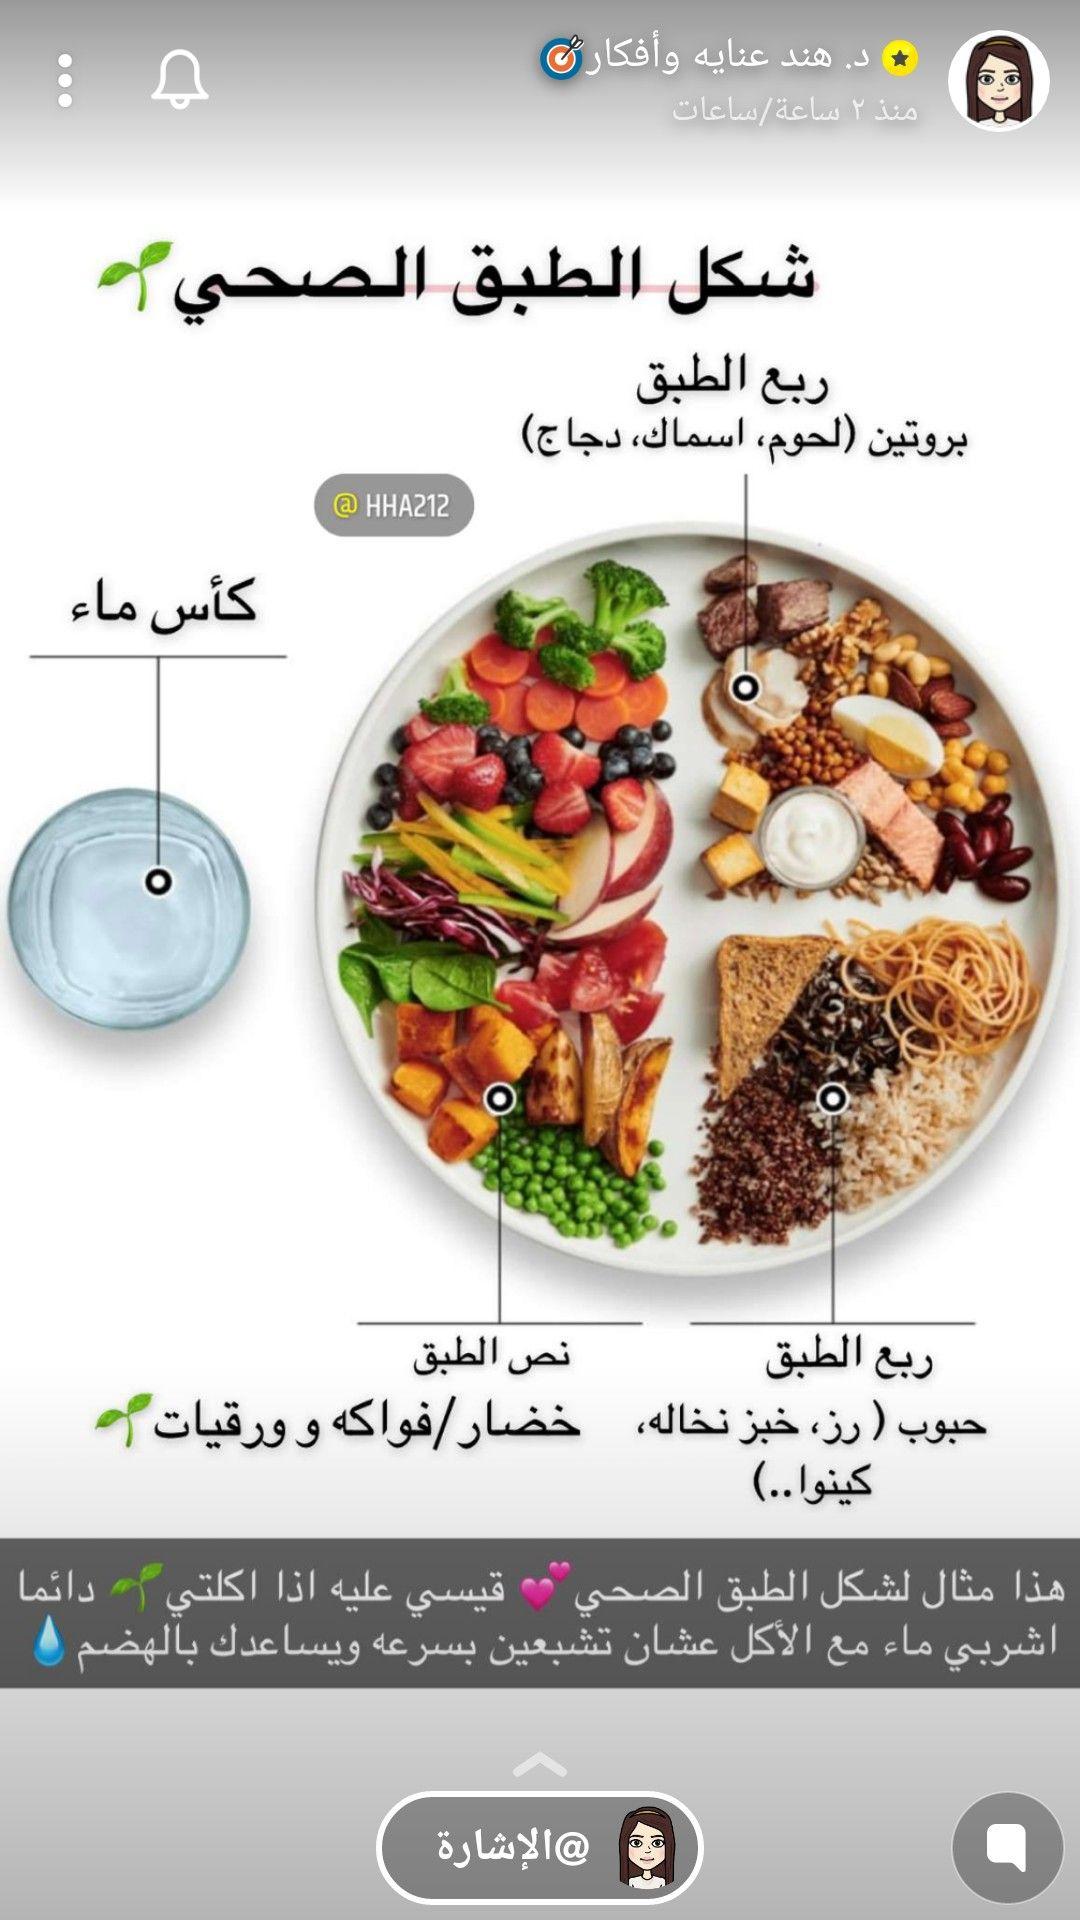 Pin By Raneem On د هند عنايه وافكار Health Fitness Food Healthy Food Swaps Healty Eating